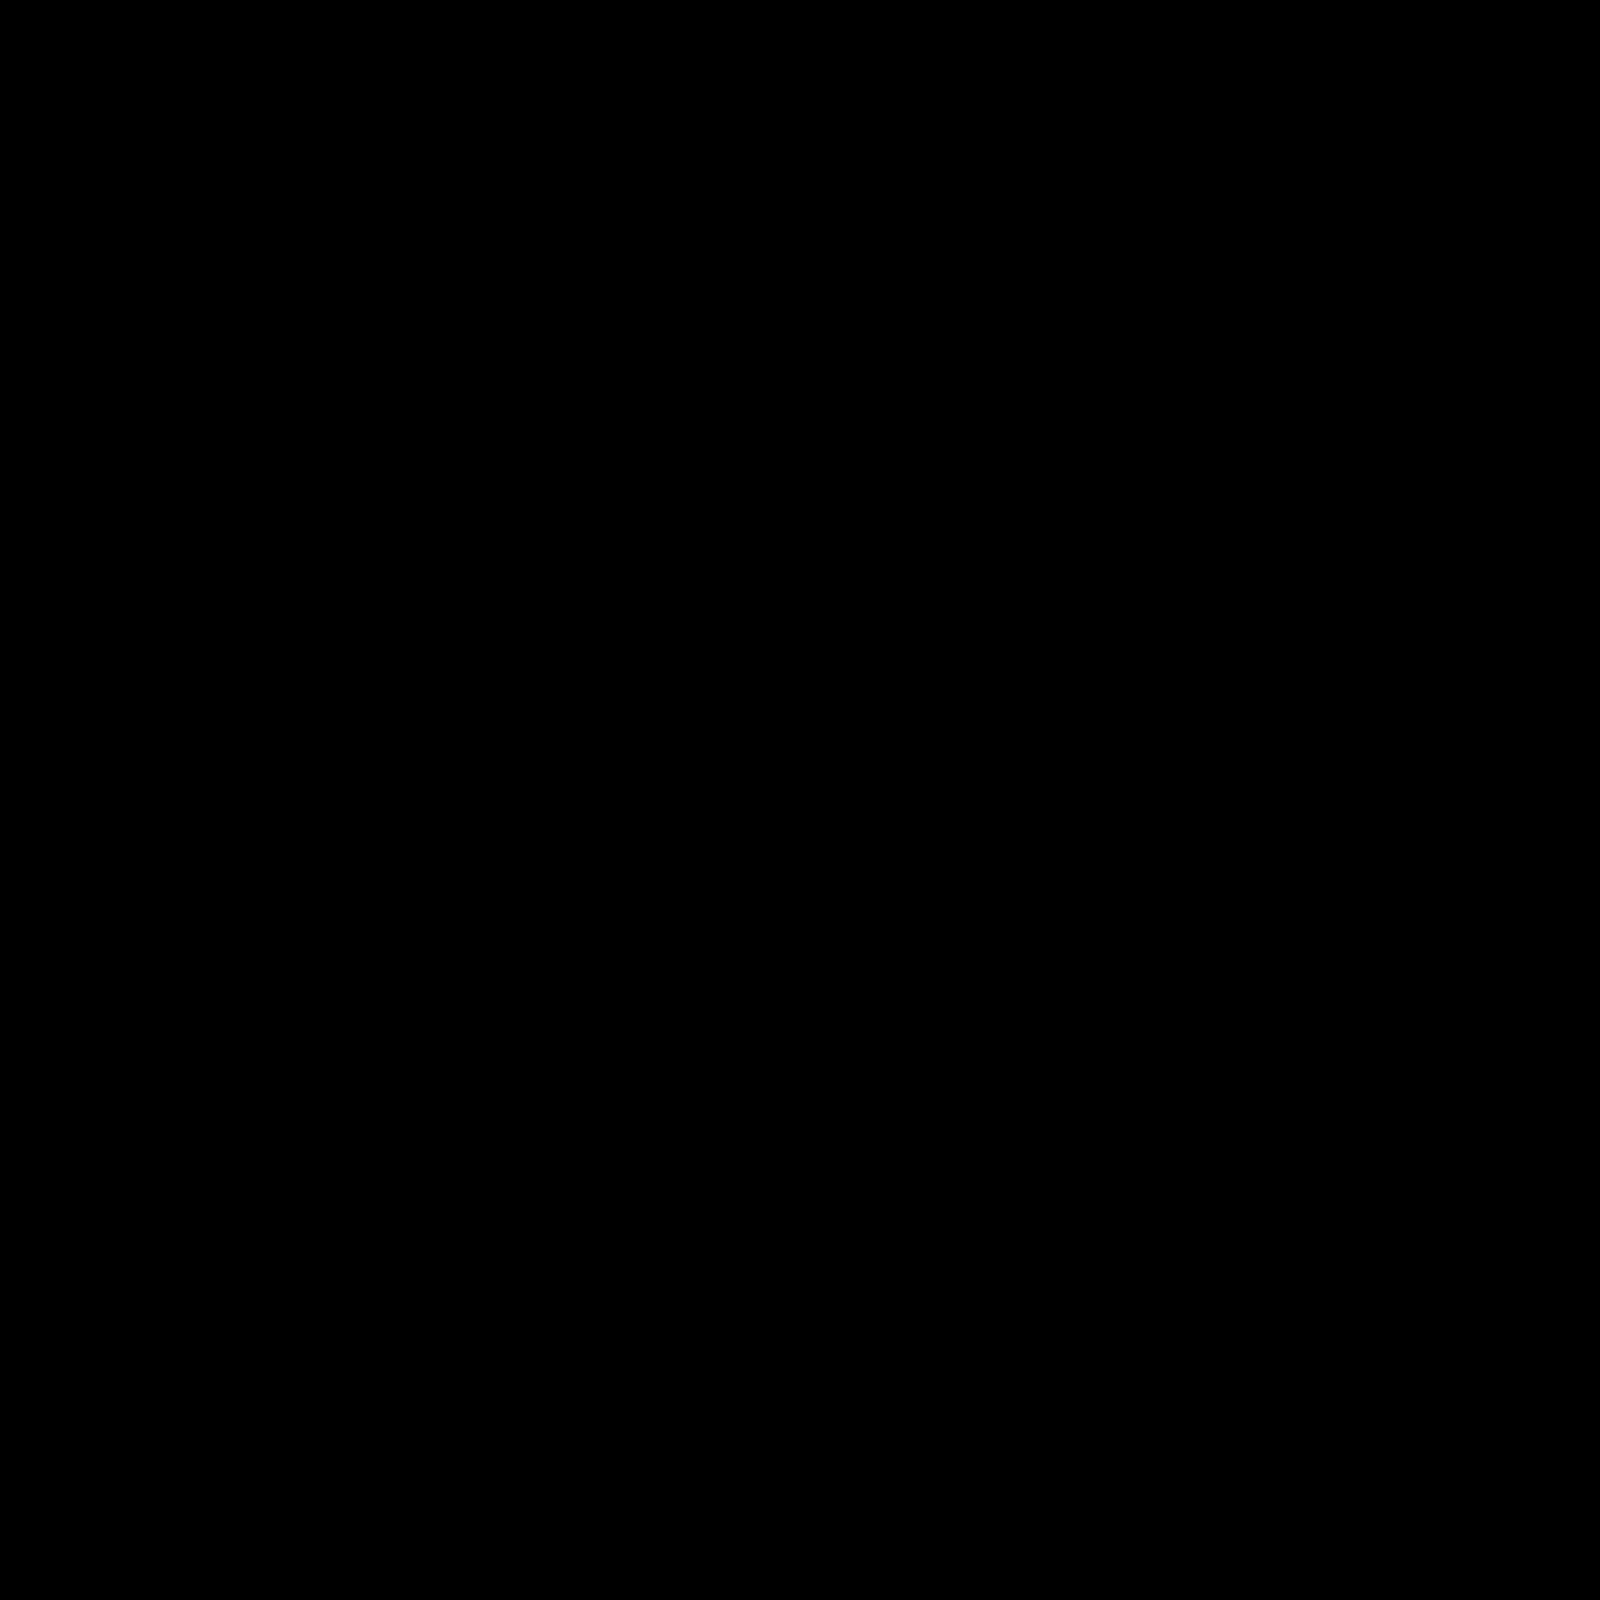 Lista odtwarzania icon